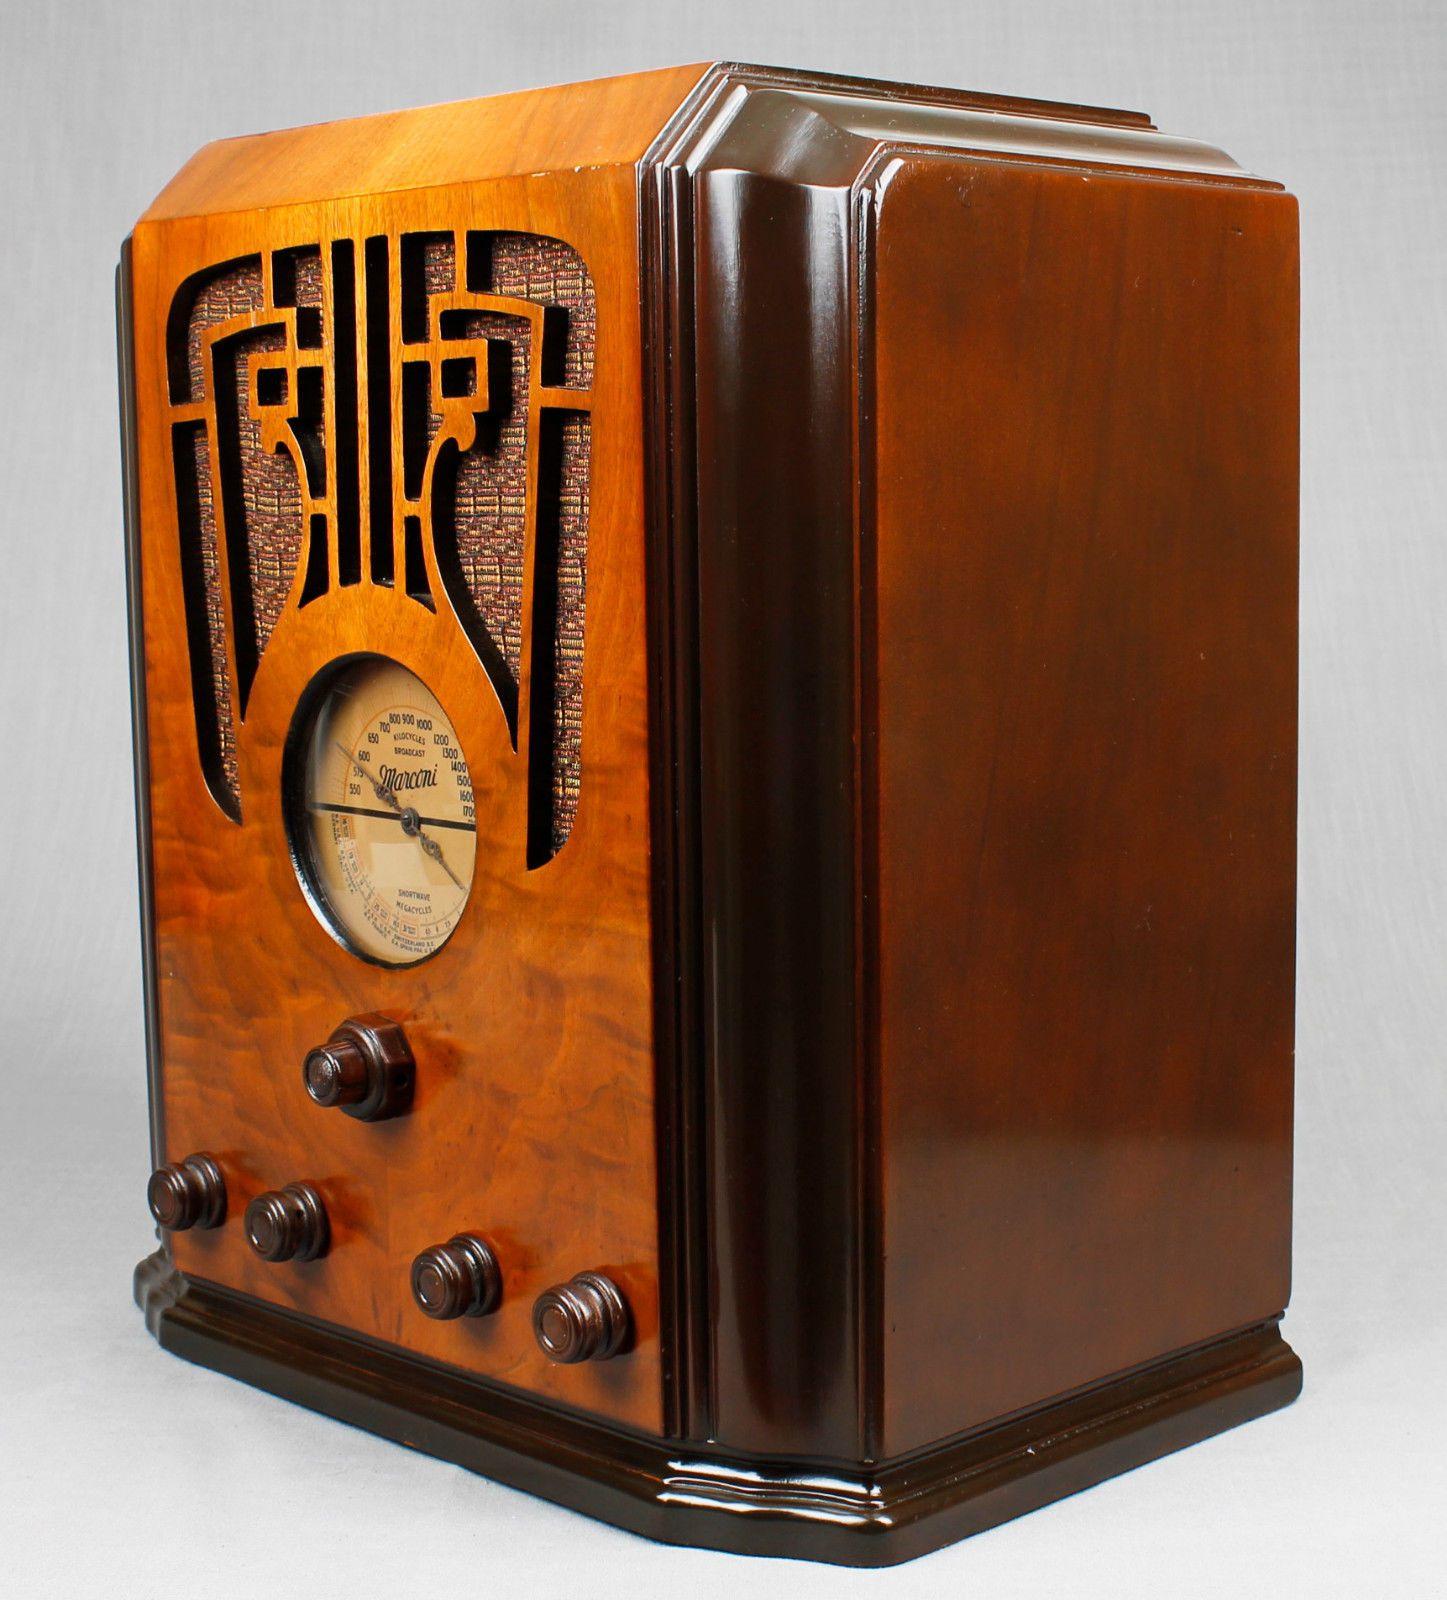 Beautiful Vintage 1936 Marconi 76 Intricate Wood Tombstone Vacuum Tube Radio Ebay Antique Radio Antique Radio Cabinet Vintage Radio